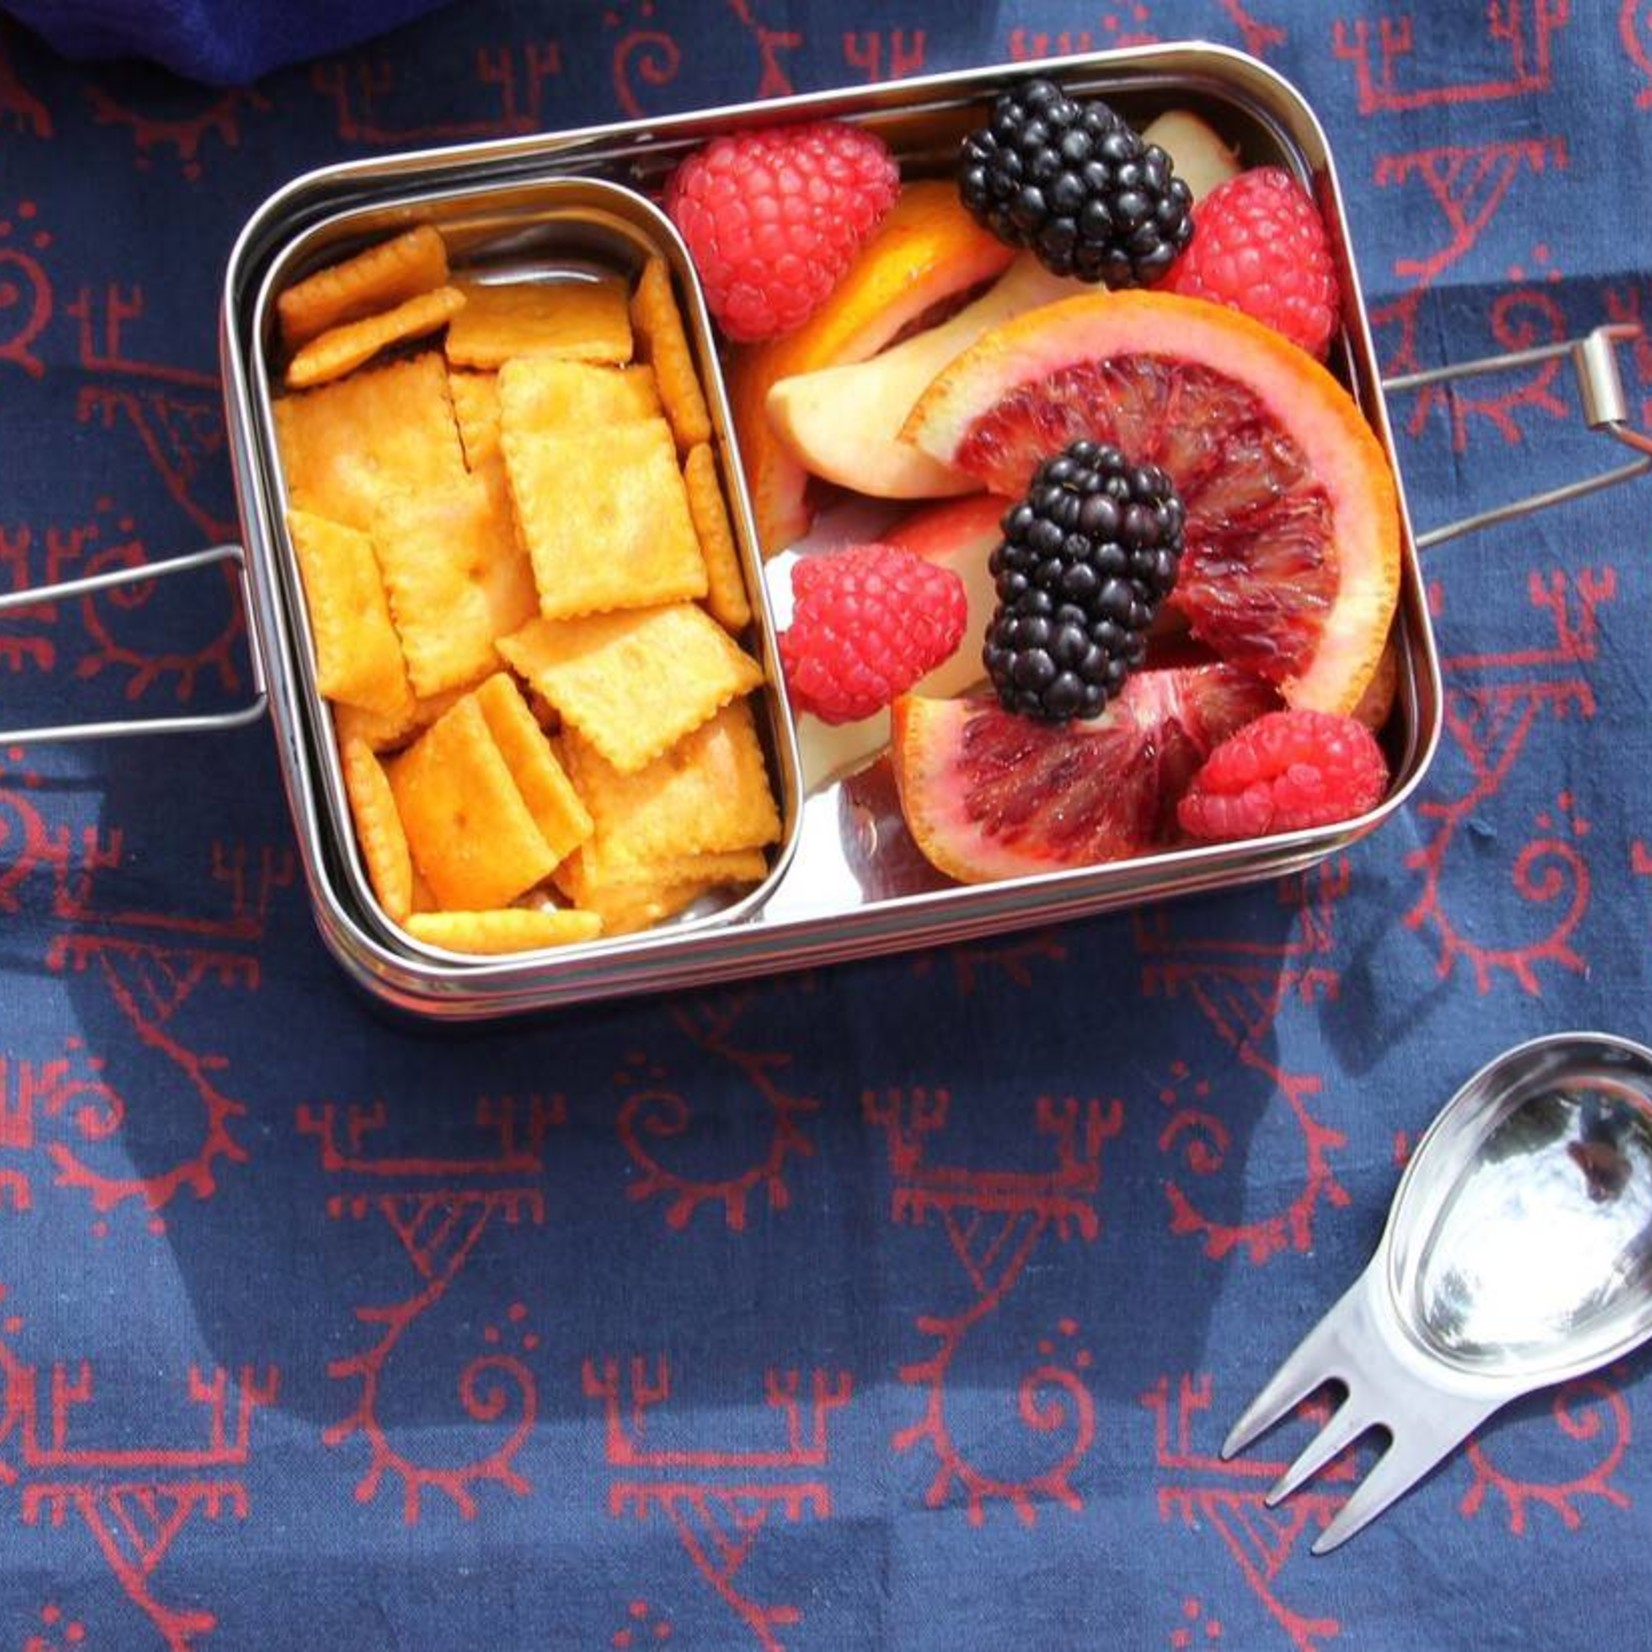 ECOlunchbox RVS Spork, een lepel en vork inéén